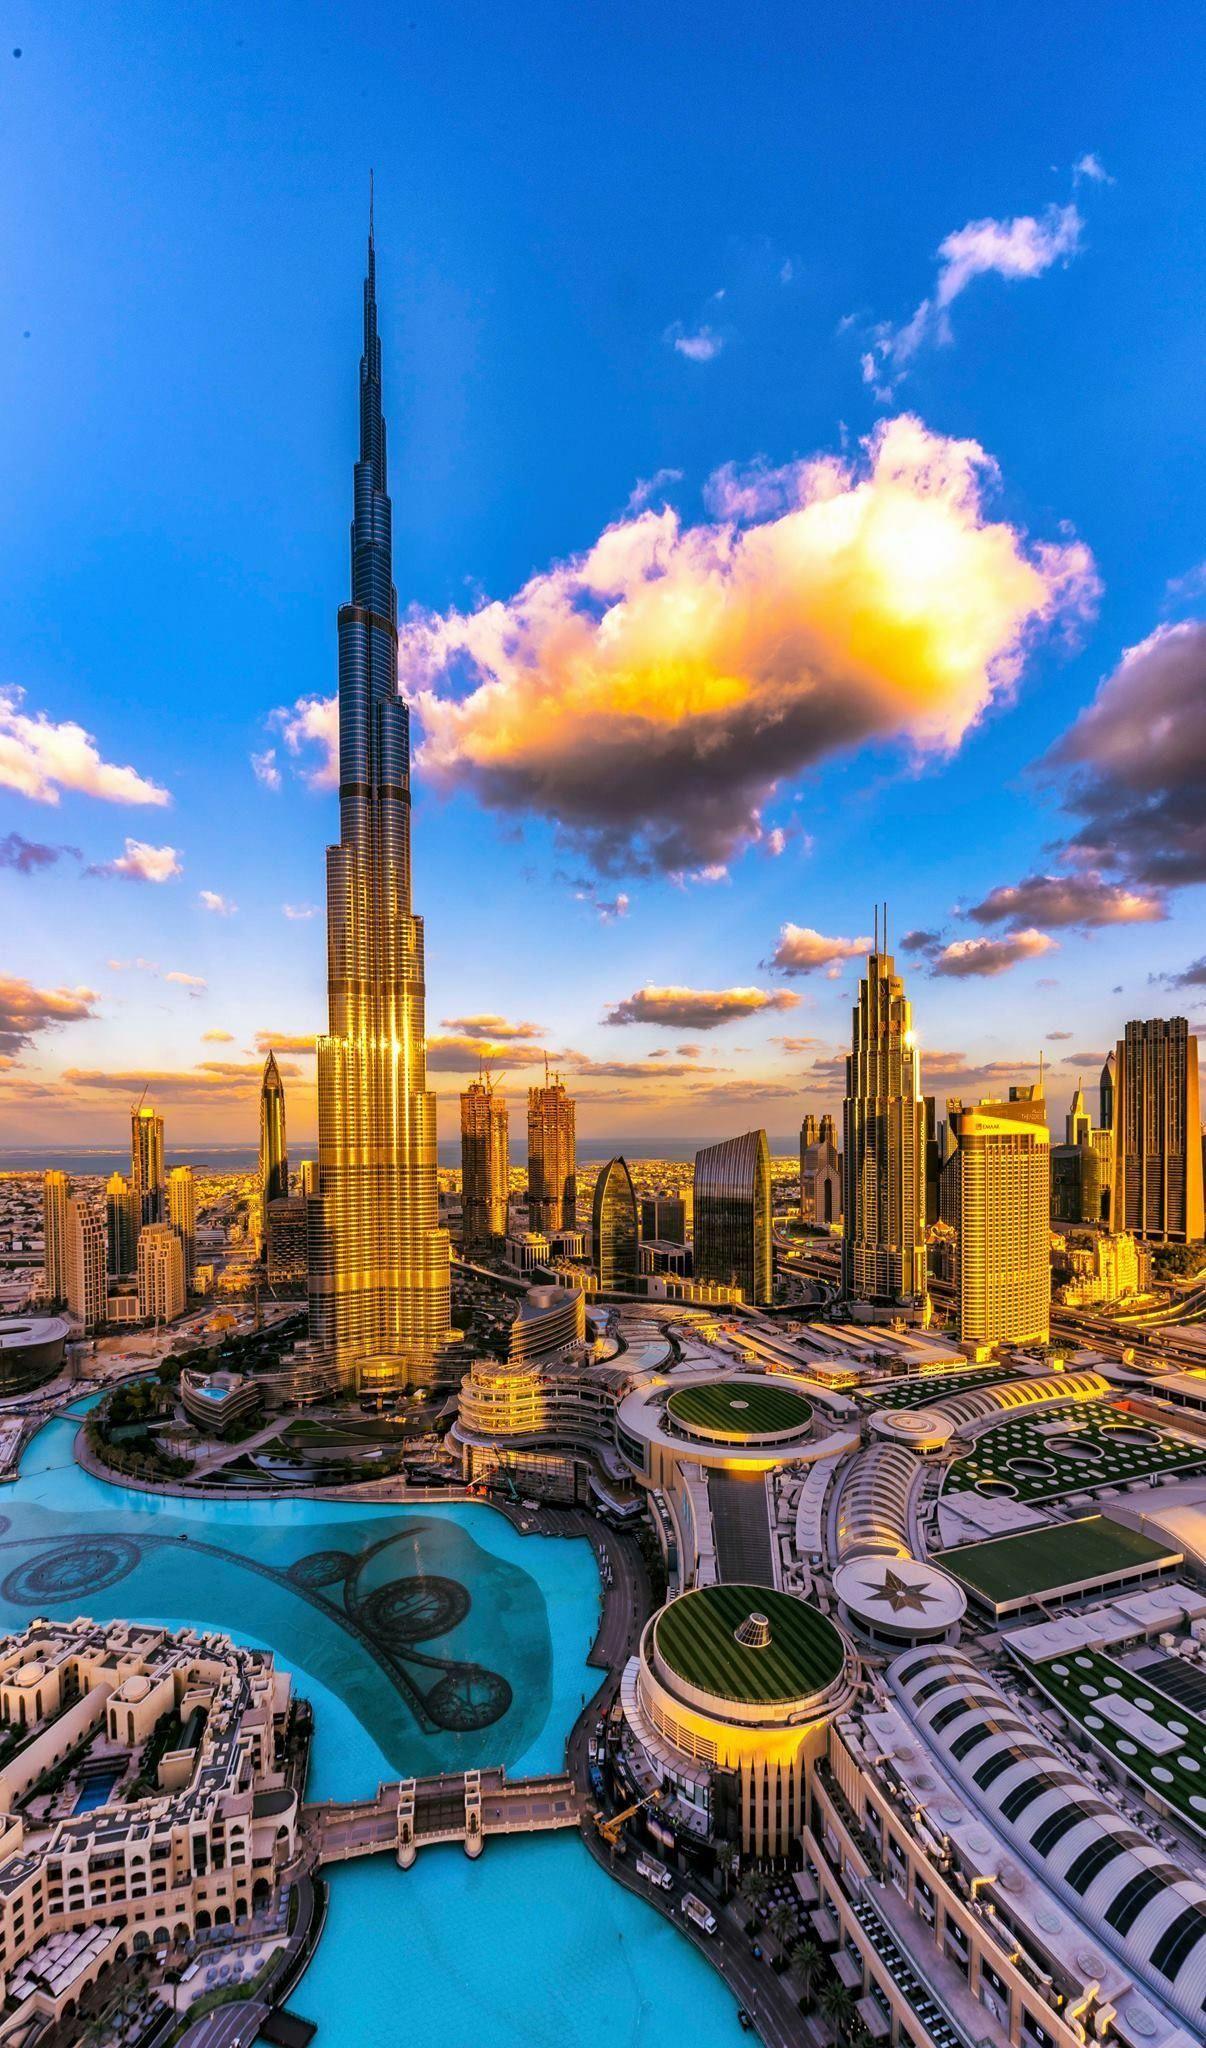 Dubai dubaigolf Dubai travel, Dubai city